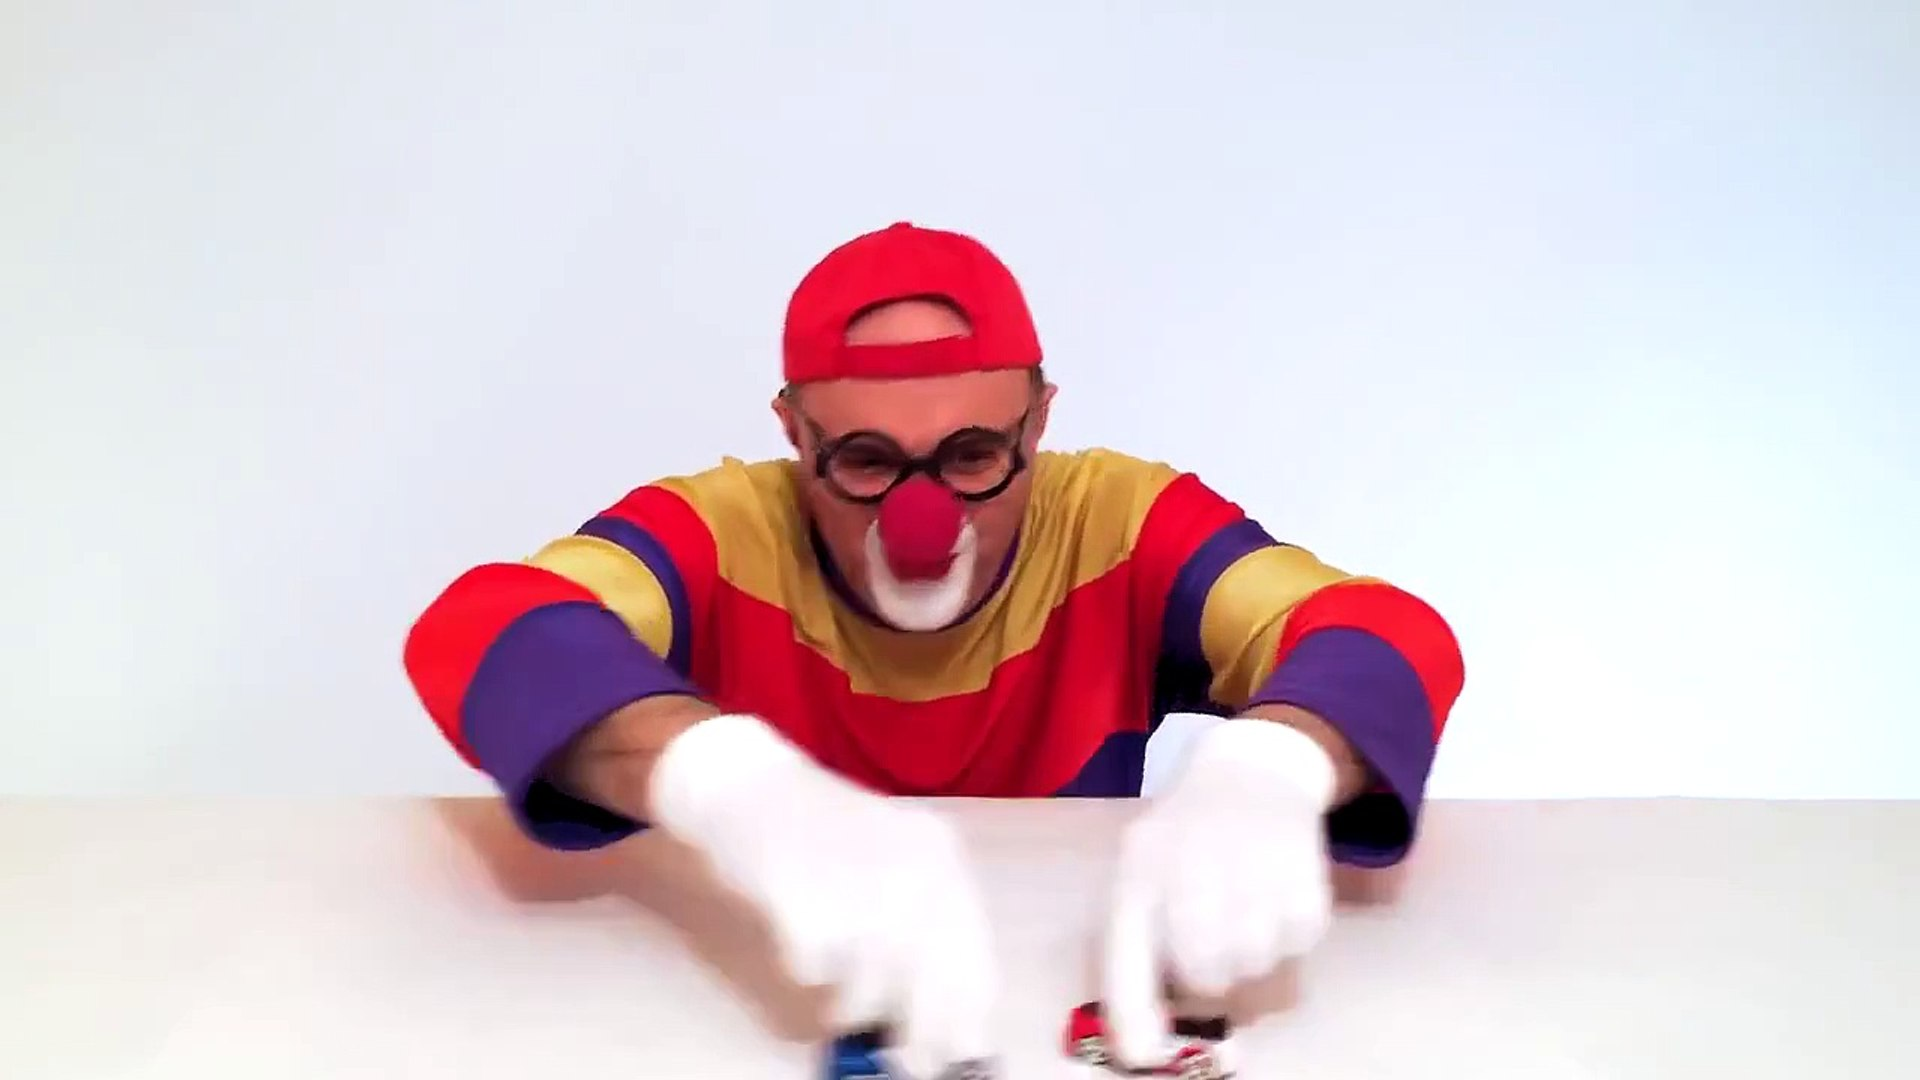 Children's Toy Cars - Transporter Rescue Truck - Clown Videos for Kids (автомобиль к